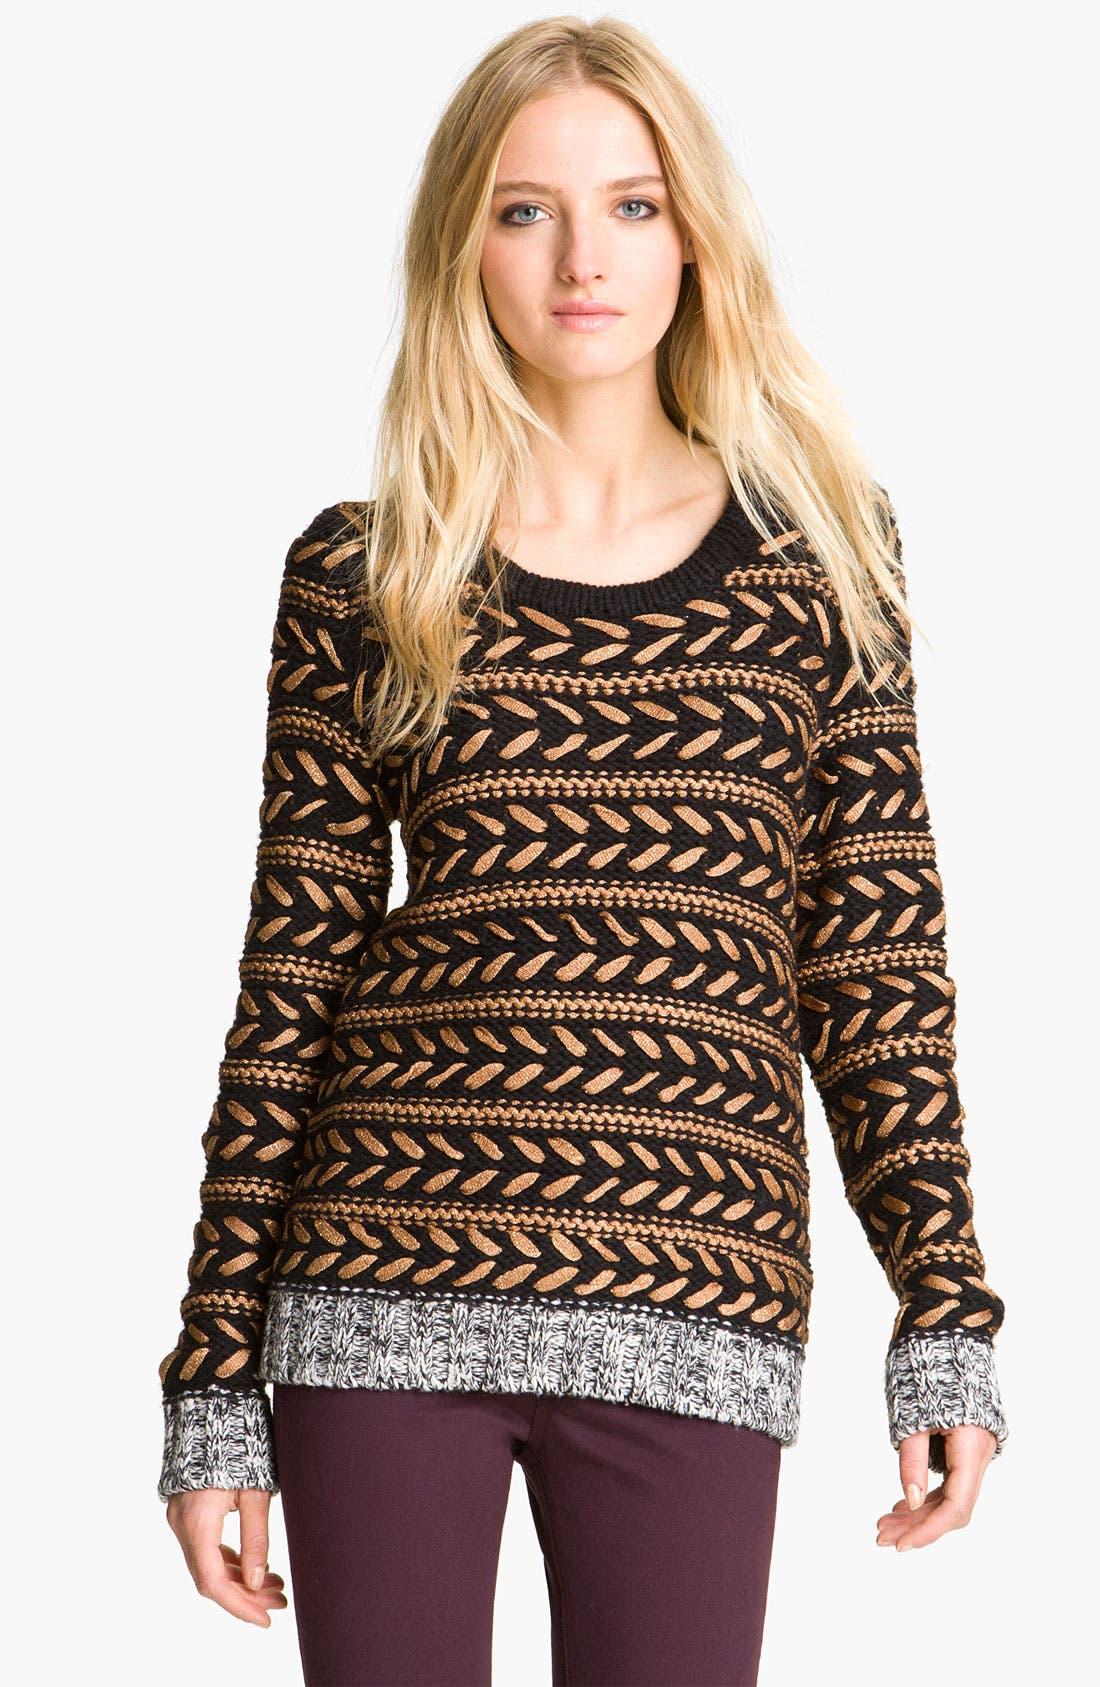 Main Image - rag & bone 'Lisbeth' Contrast Crewneck Sweater